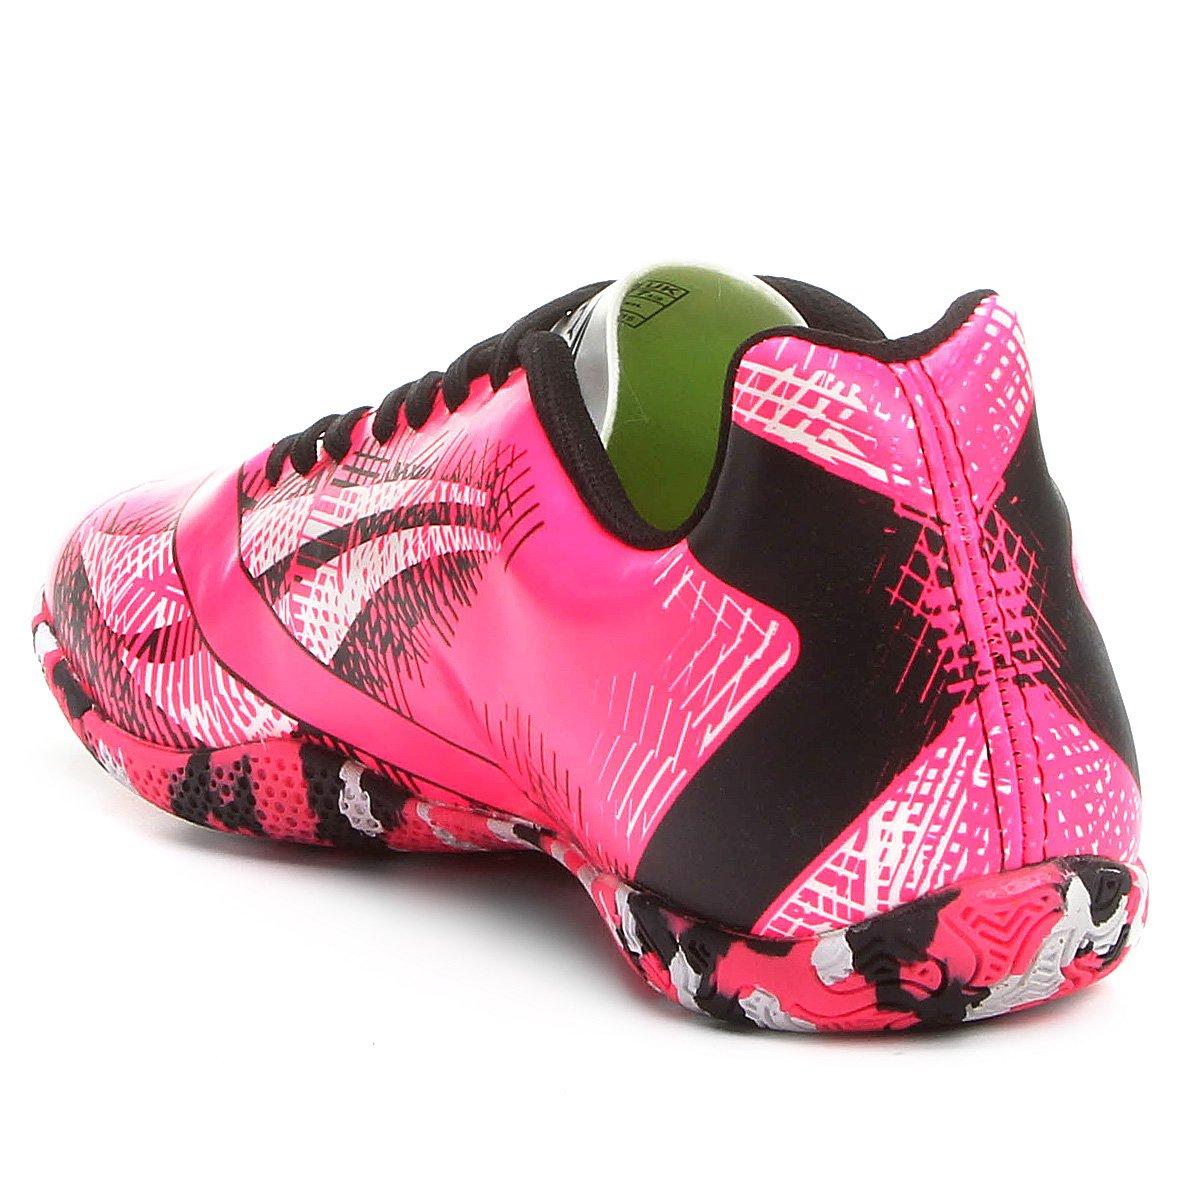 25cc1f7351 Chuteira Futsal Penalty Victoria RX 2 VI - Compre Agora